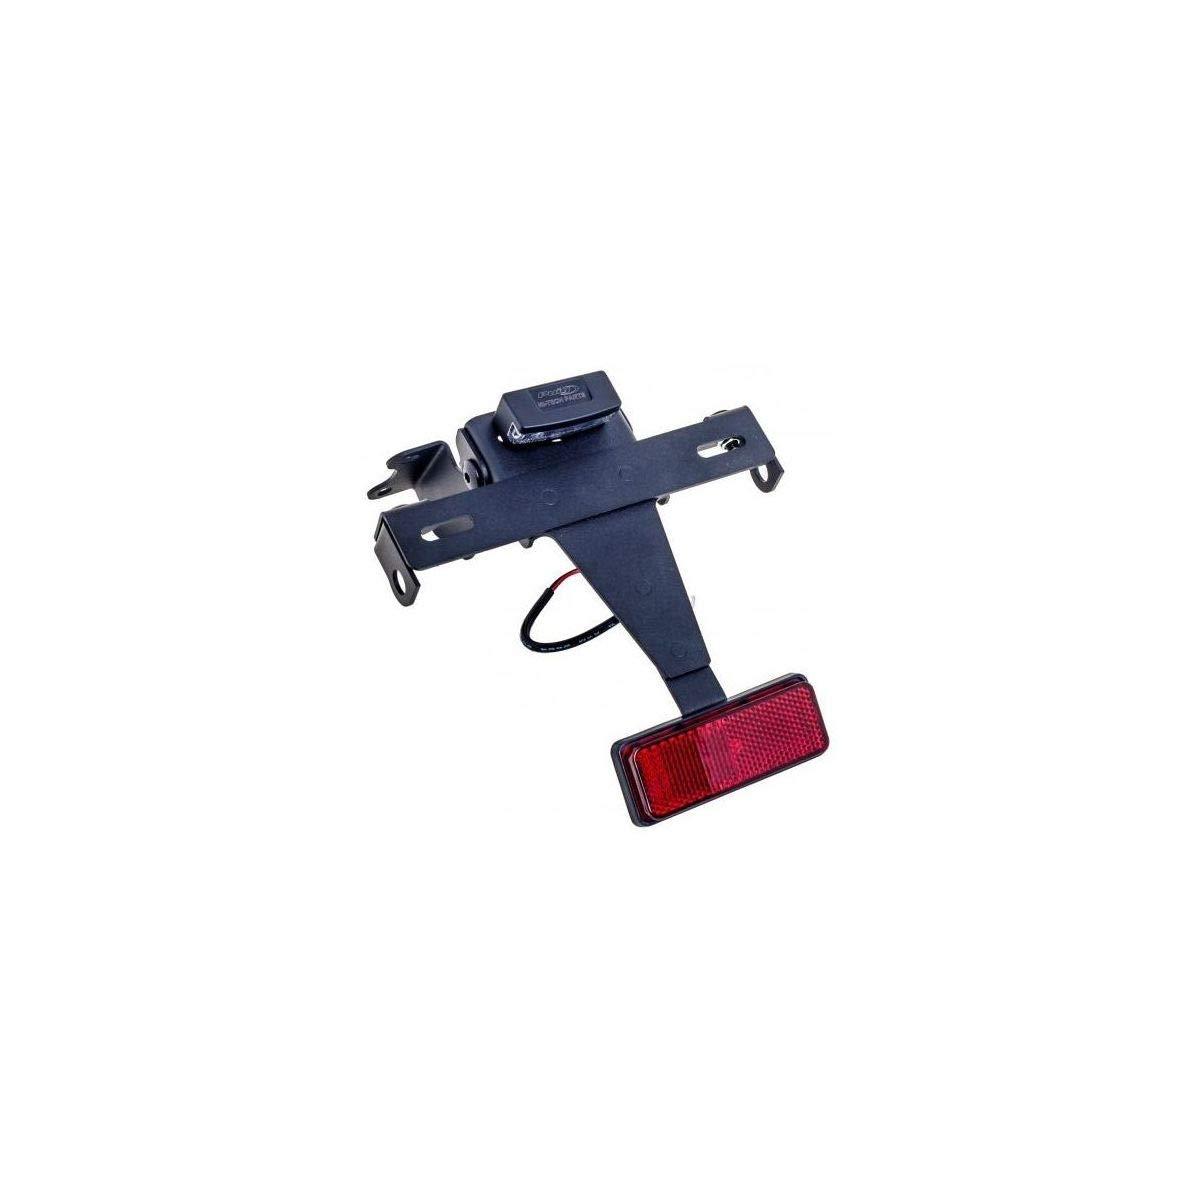 17-18 DUCATI MON797: Puig Fender Eliminator Kit (Black) 9496N